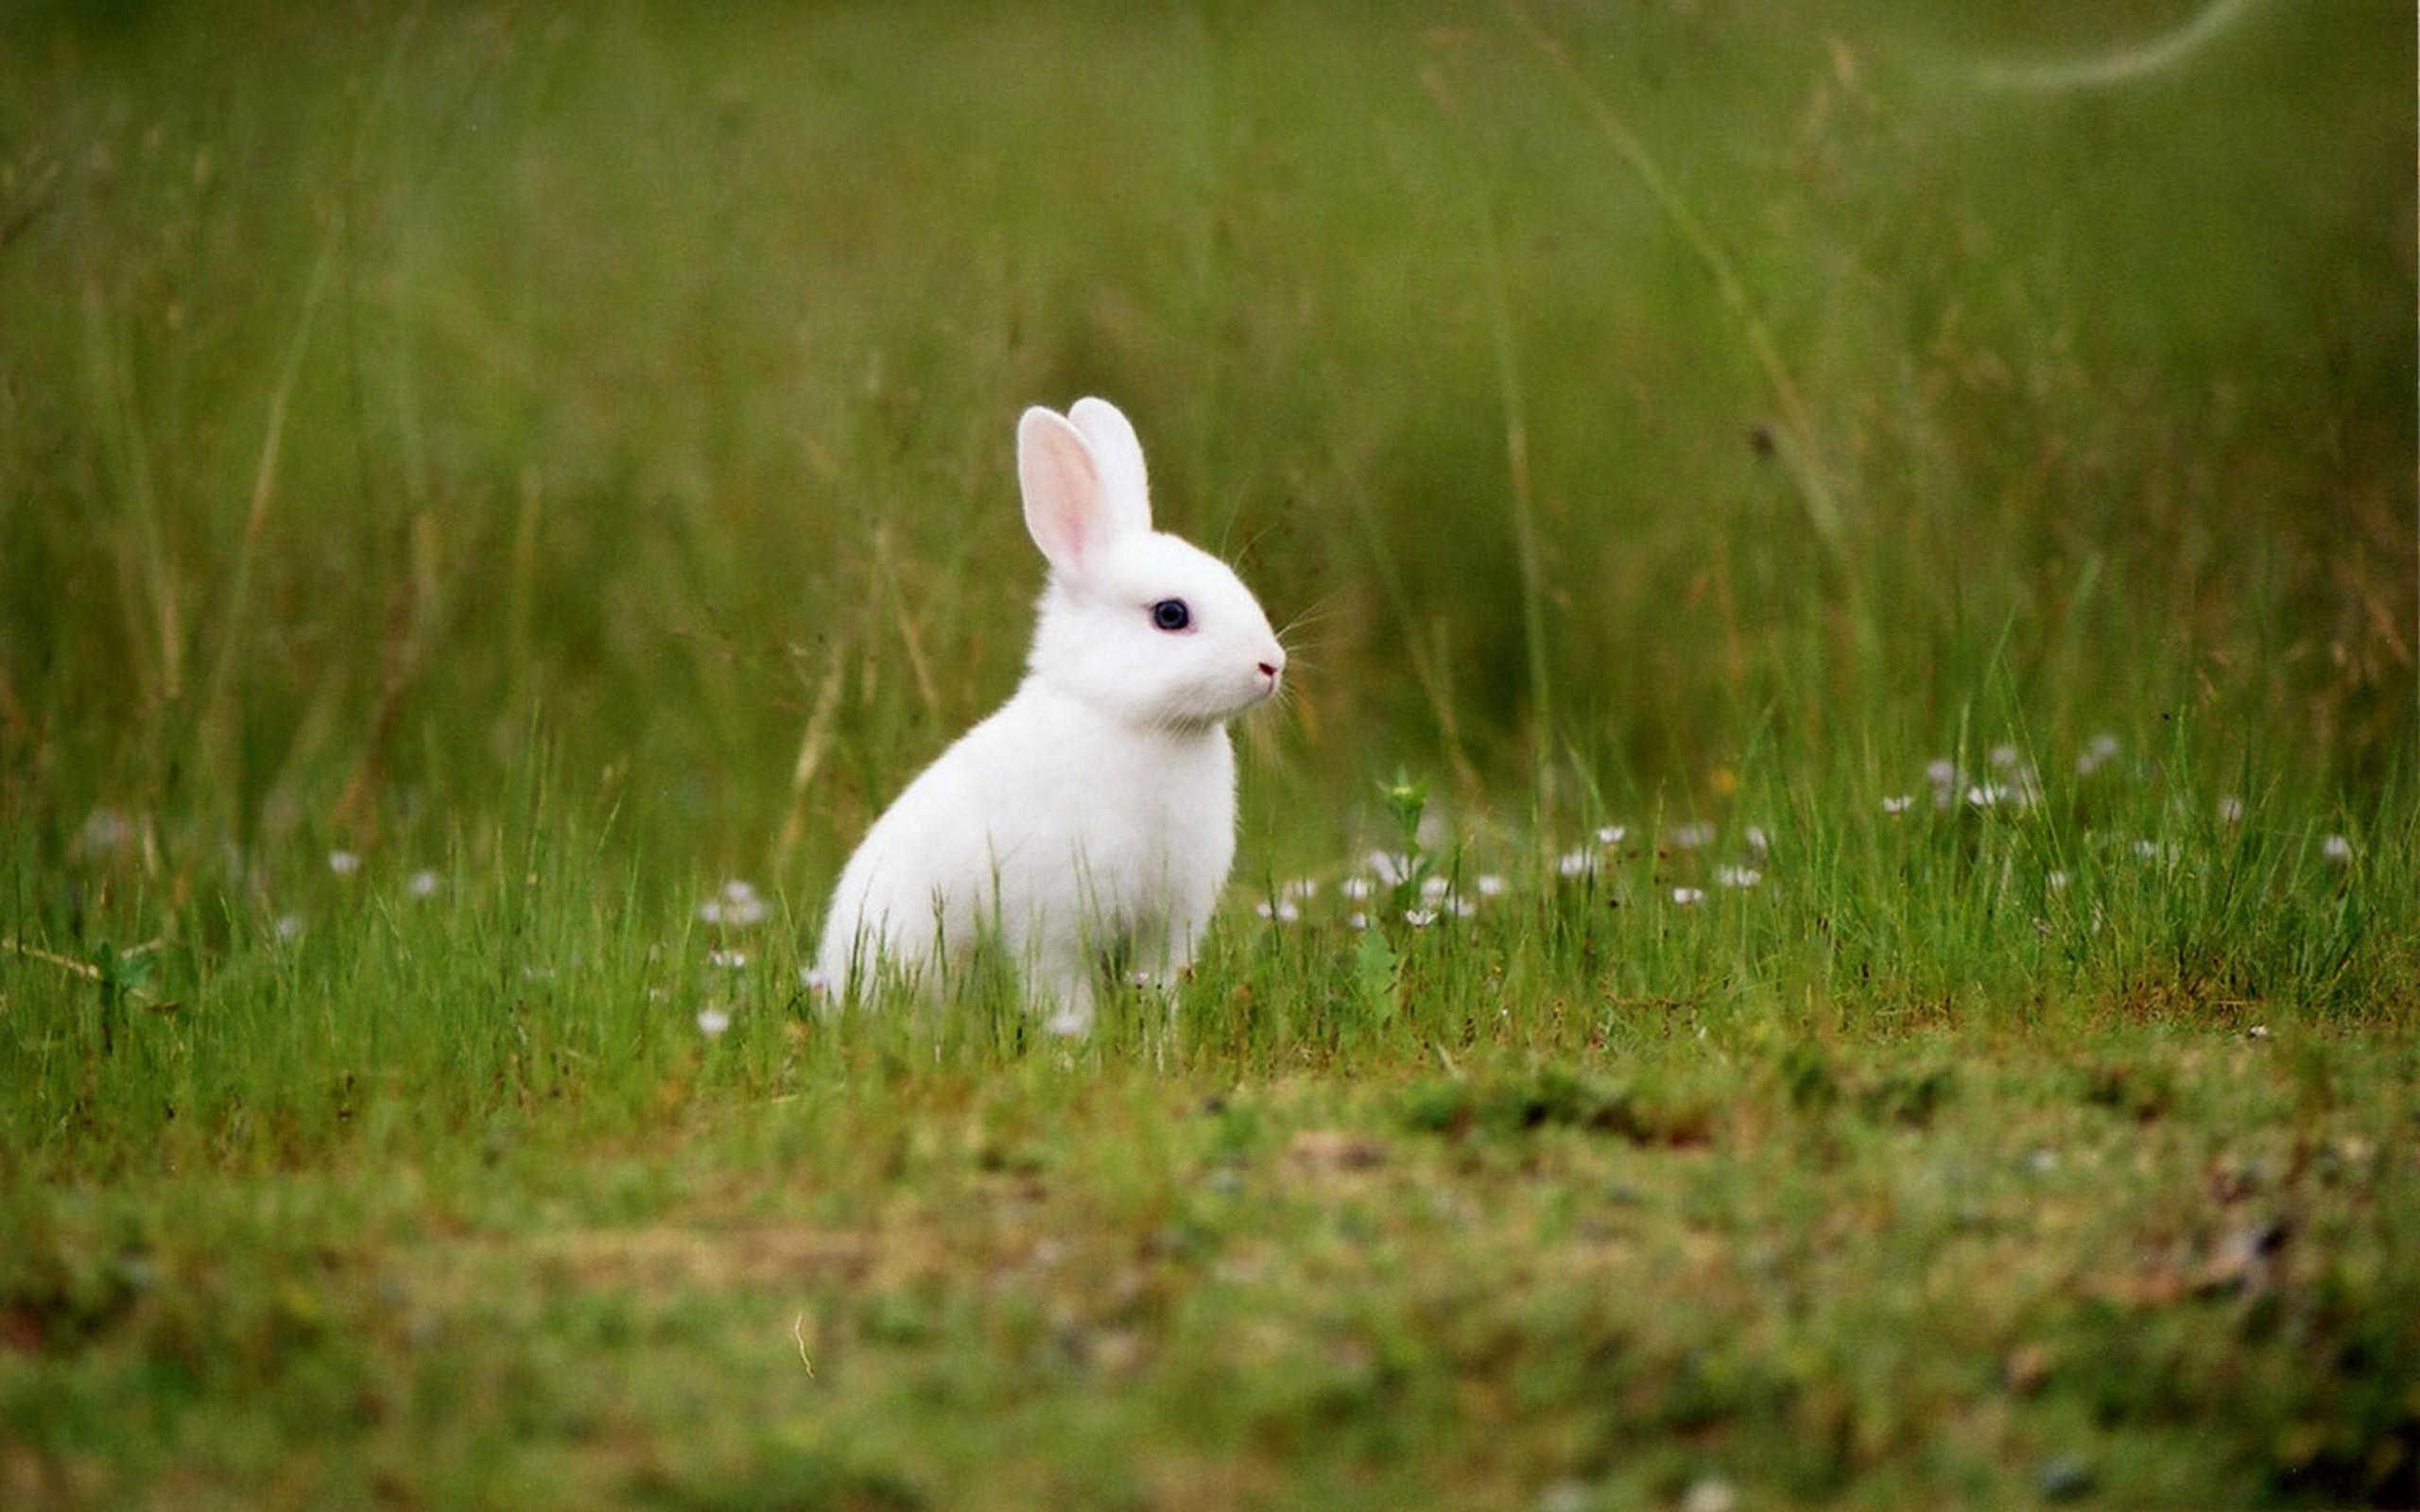 Rabbit Wallpapers For Desktop (65+ Images